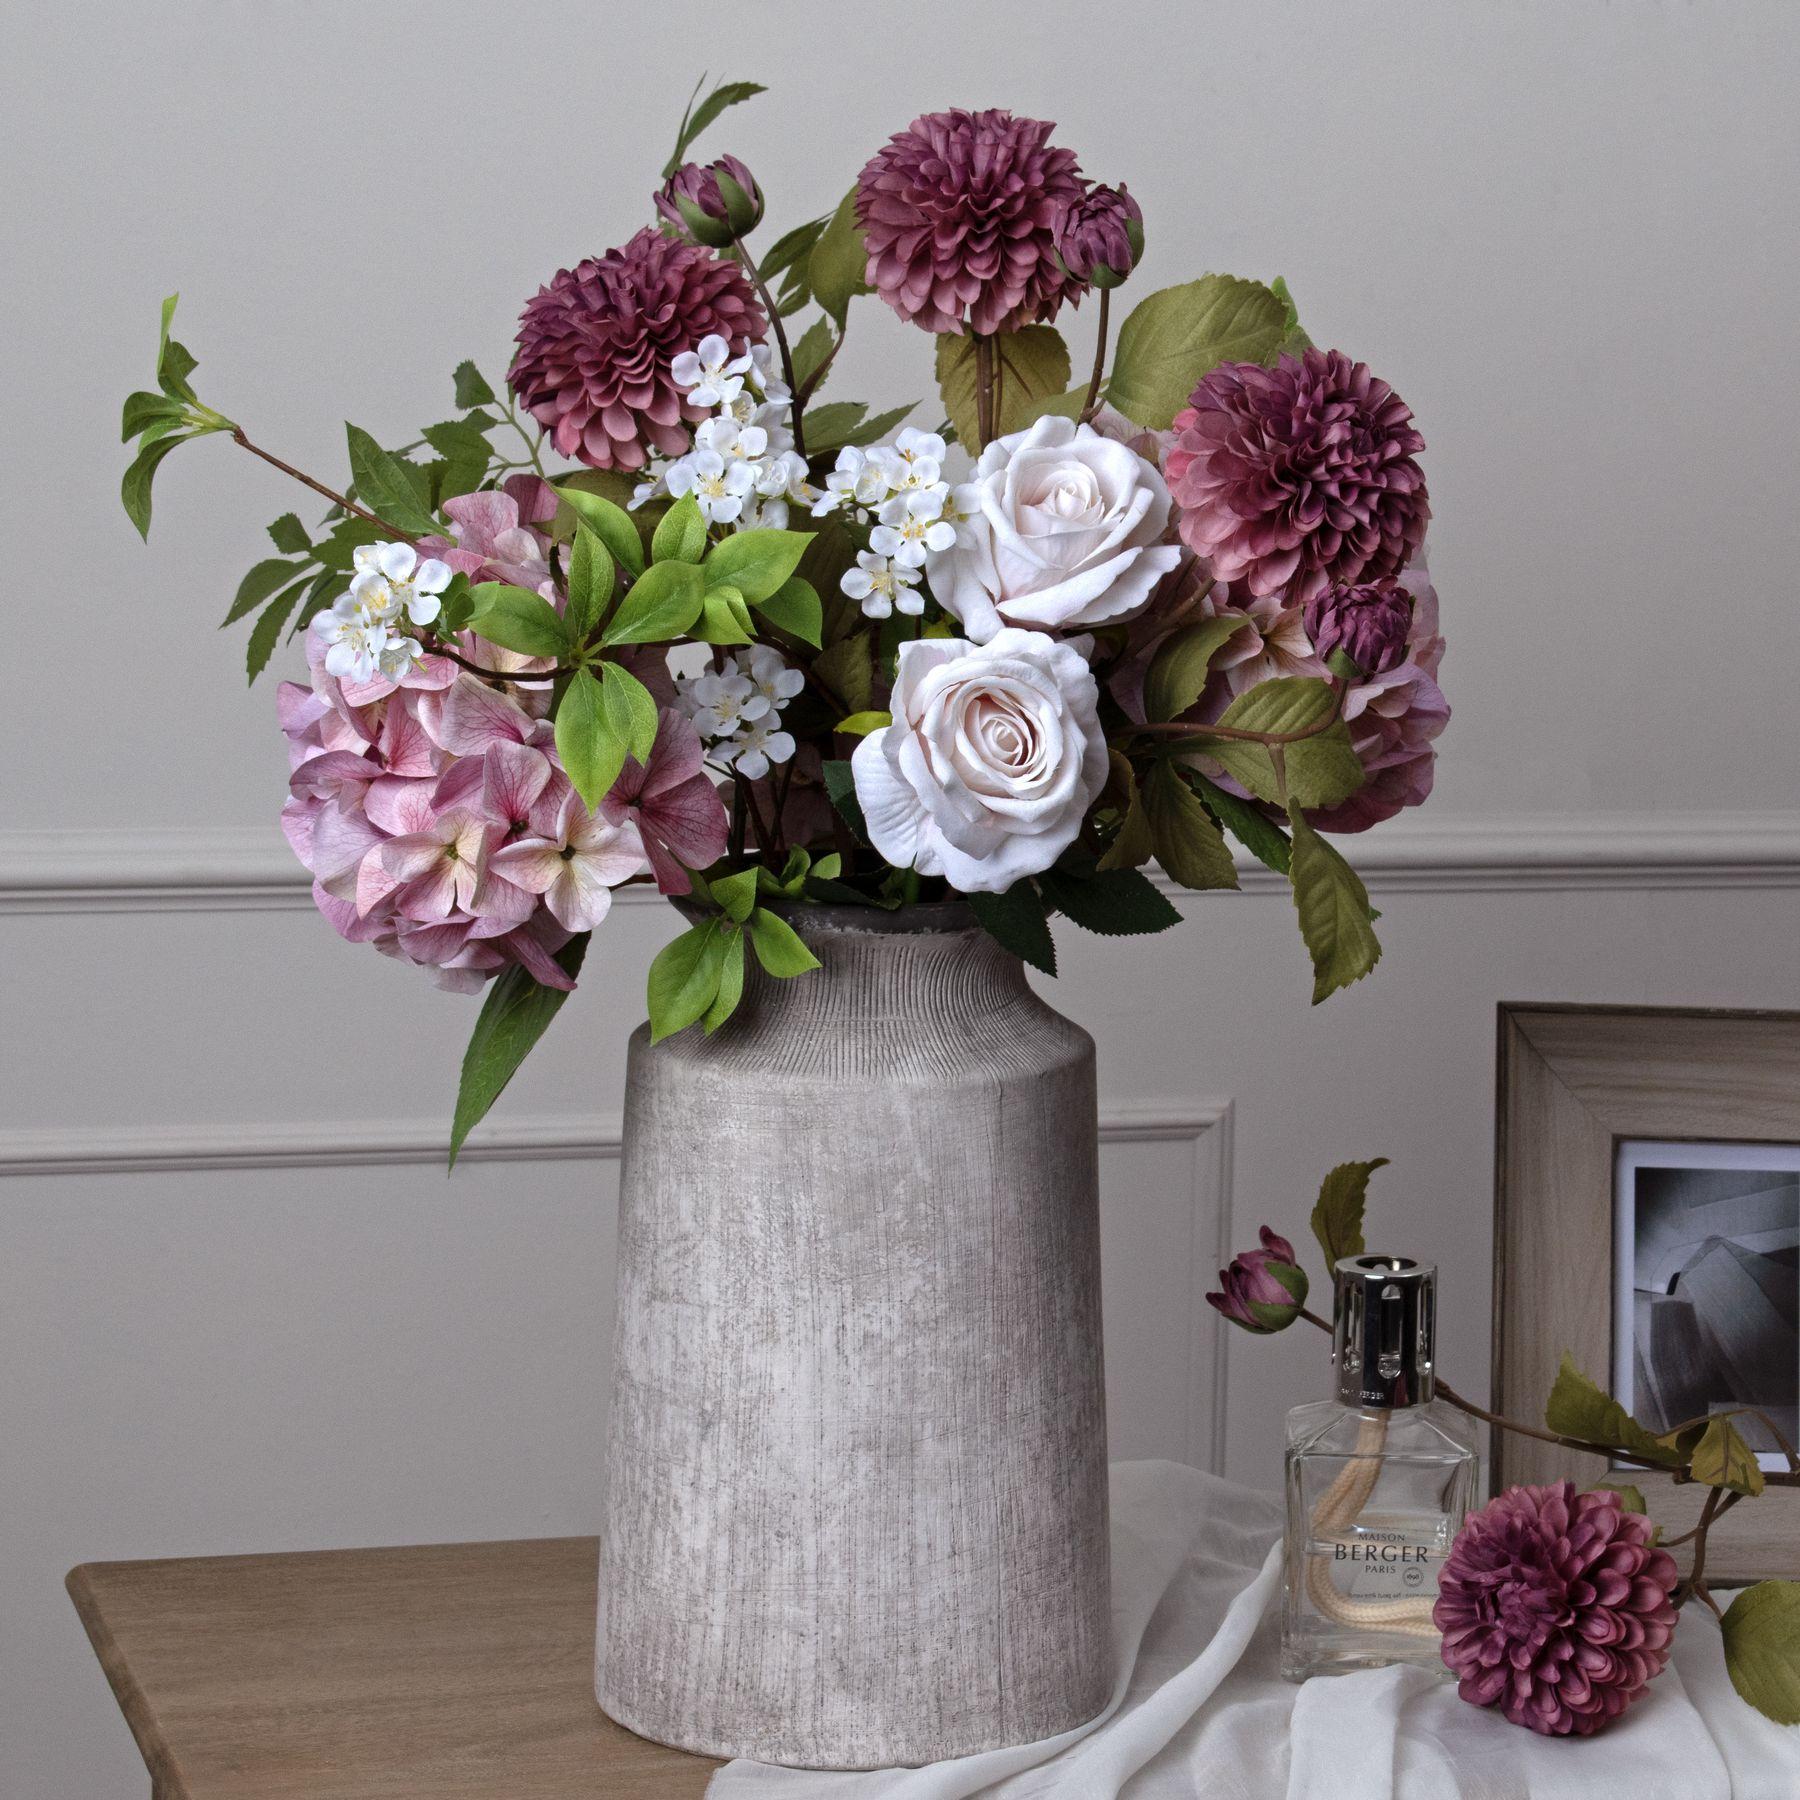 Bloomville Urn Stone Vase - Image 3